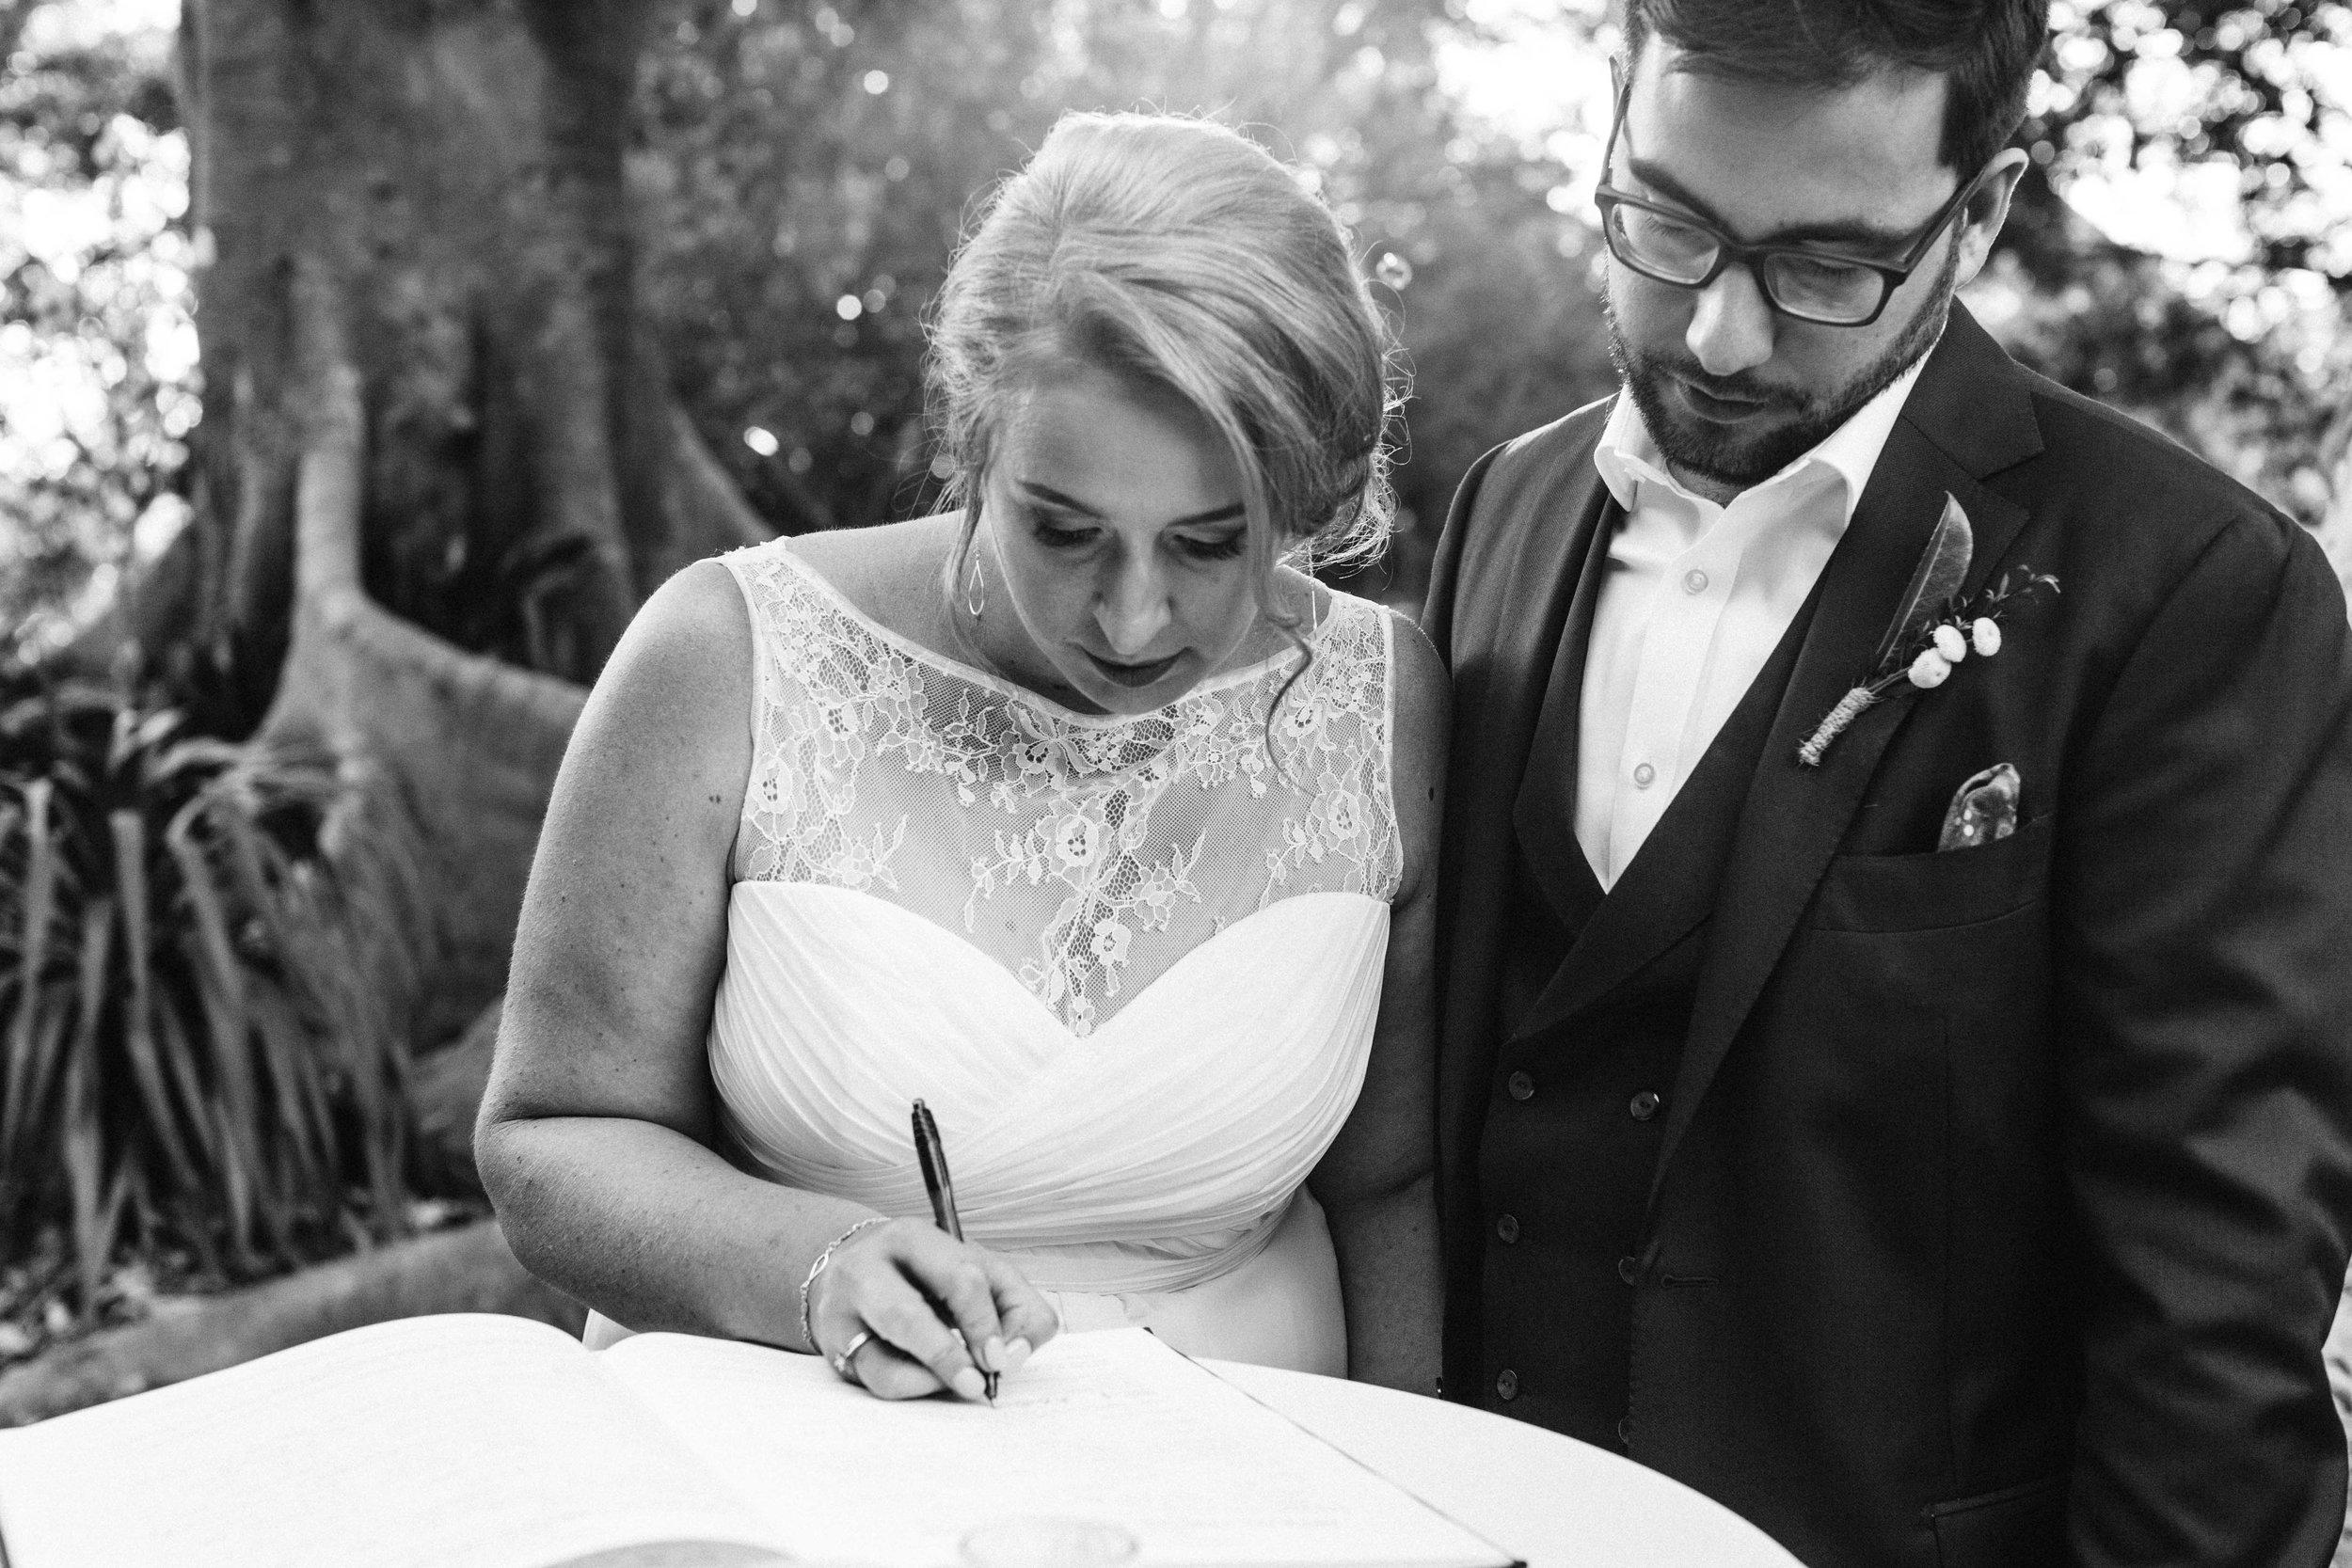 cabarita-park-sydney-wedding-emilyobrienphotography.net-29.jpg